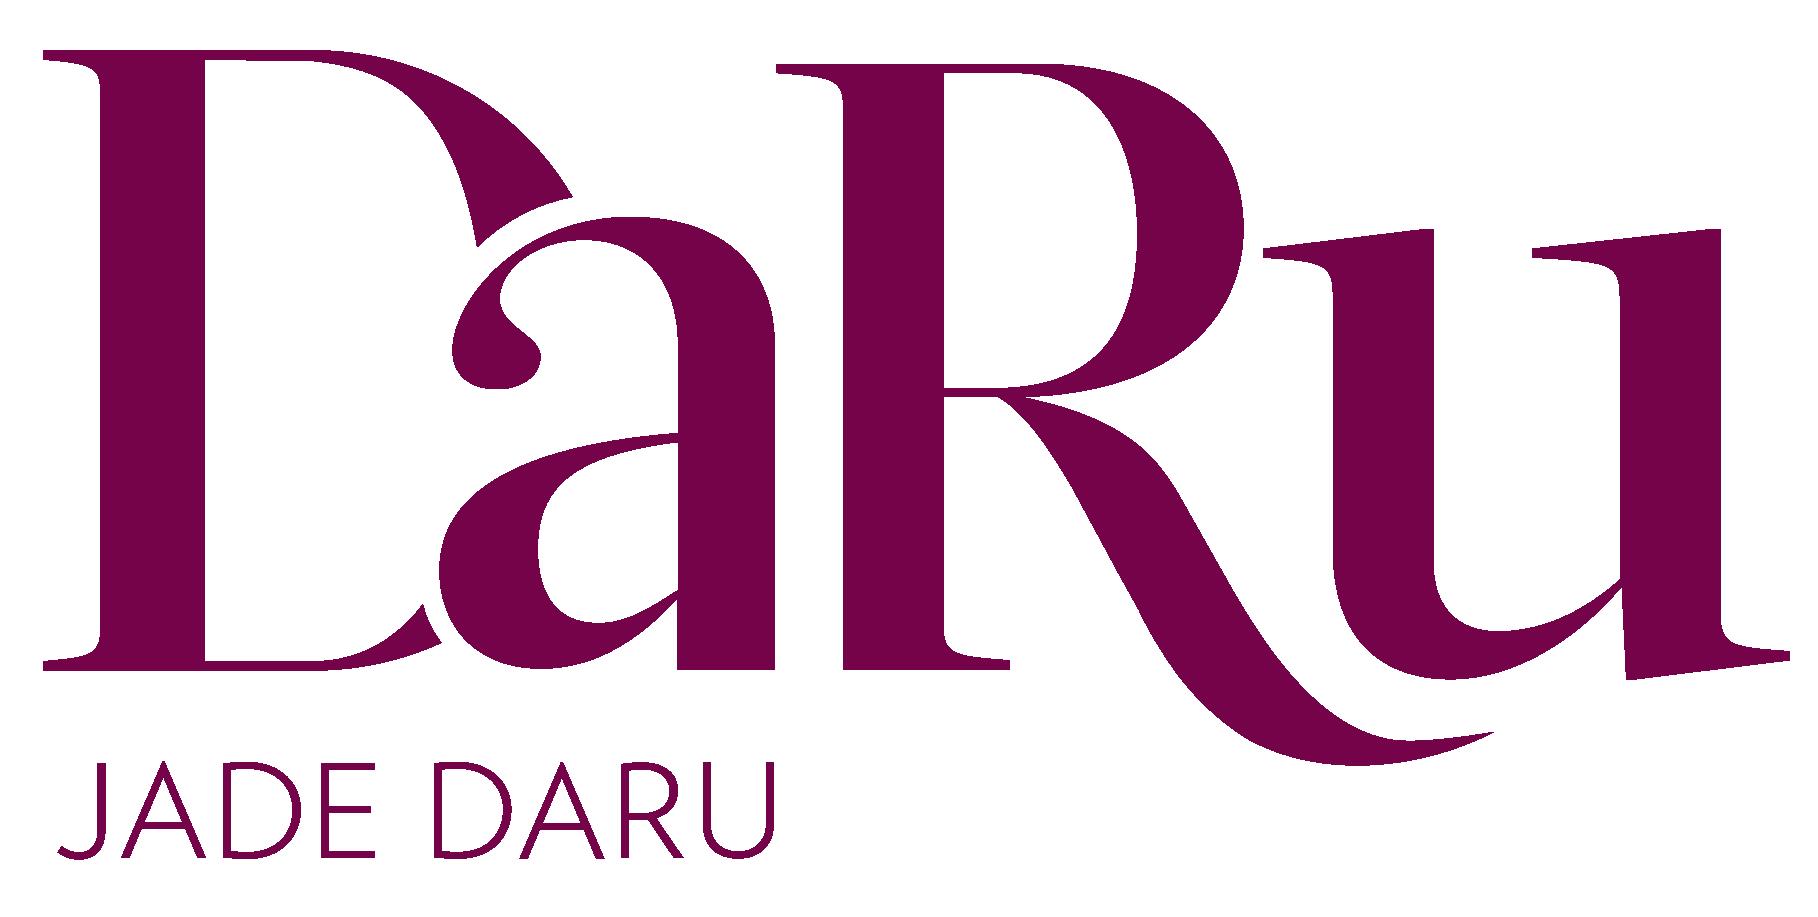 Jade Daru